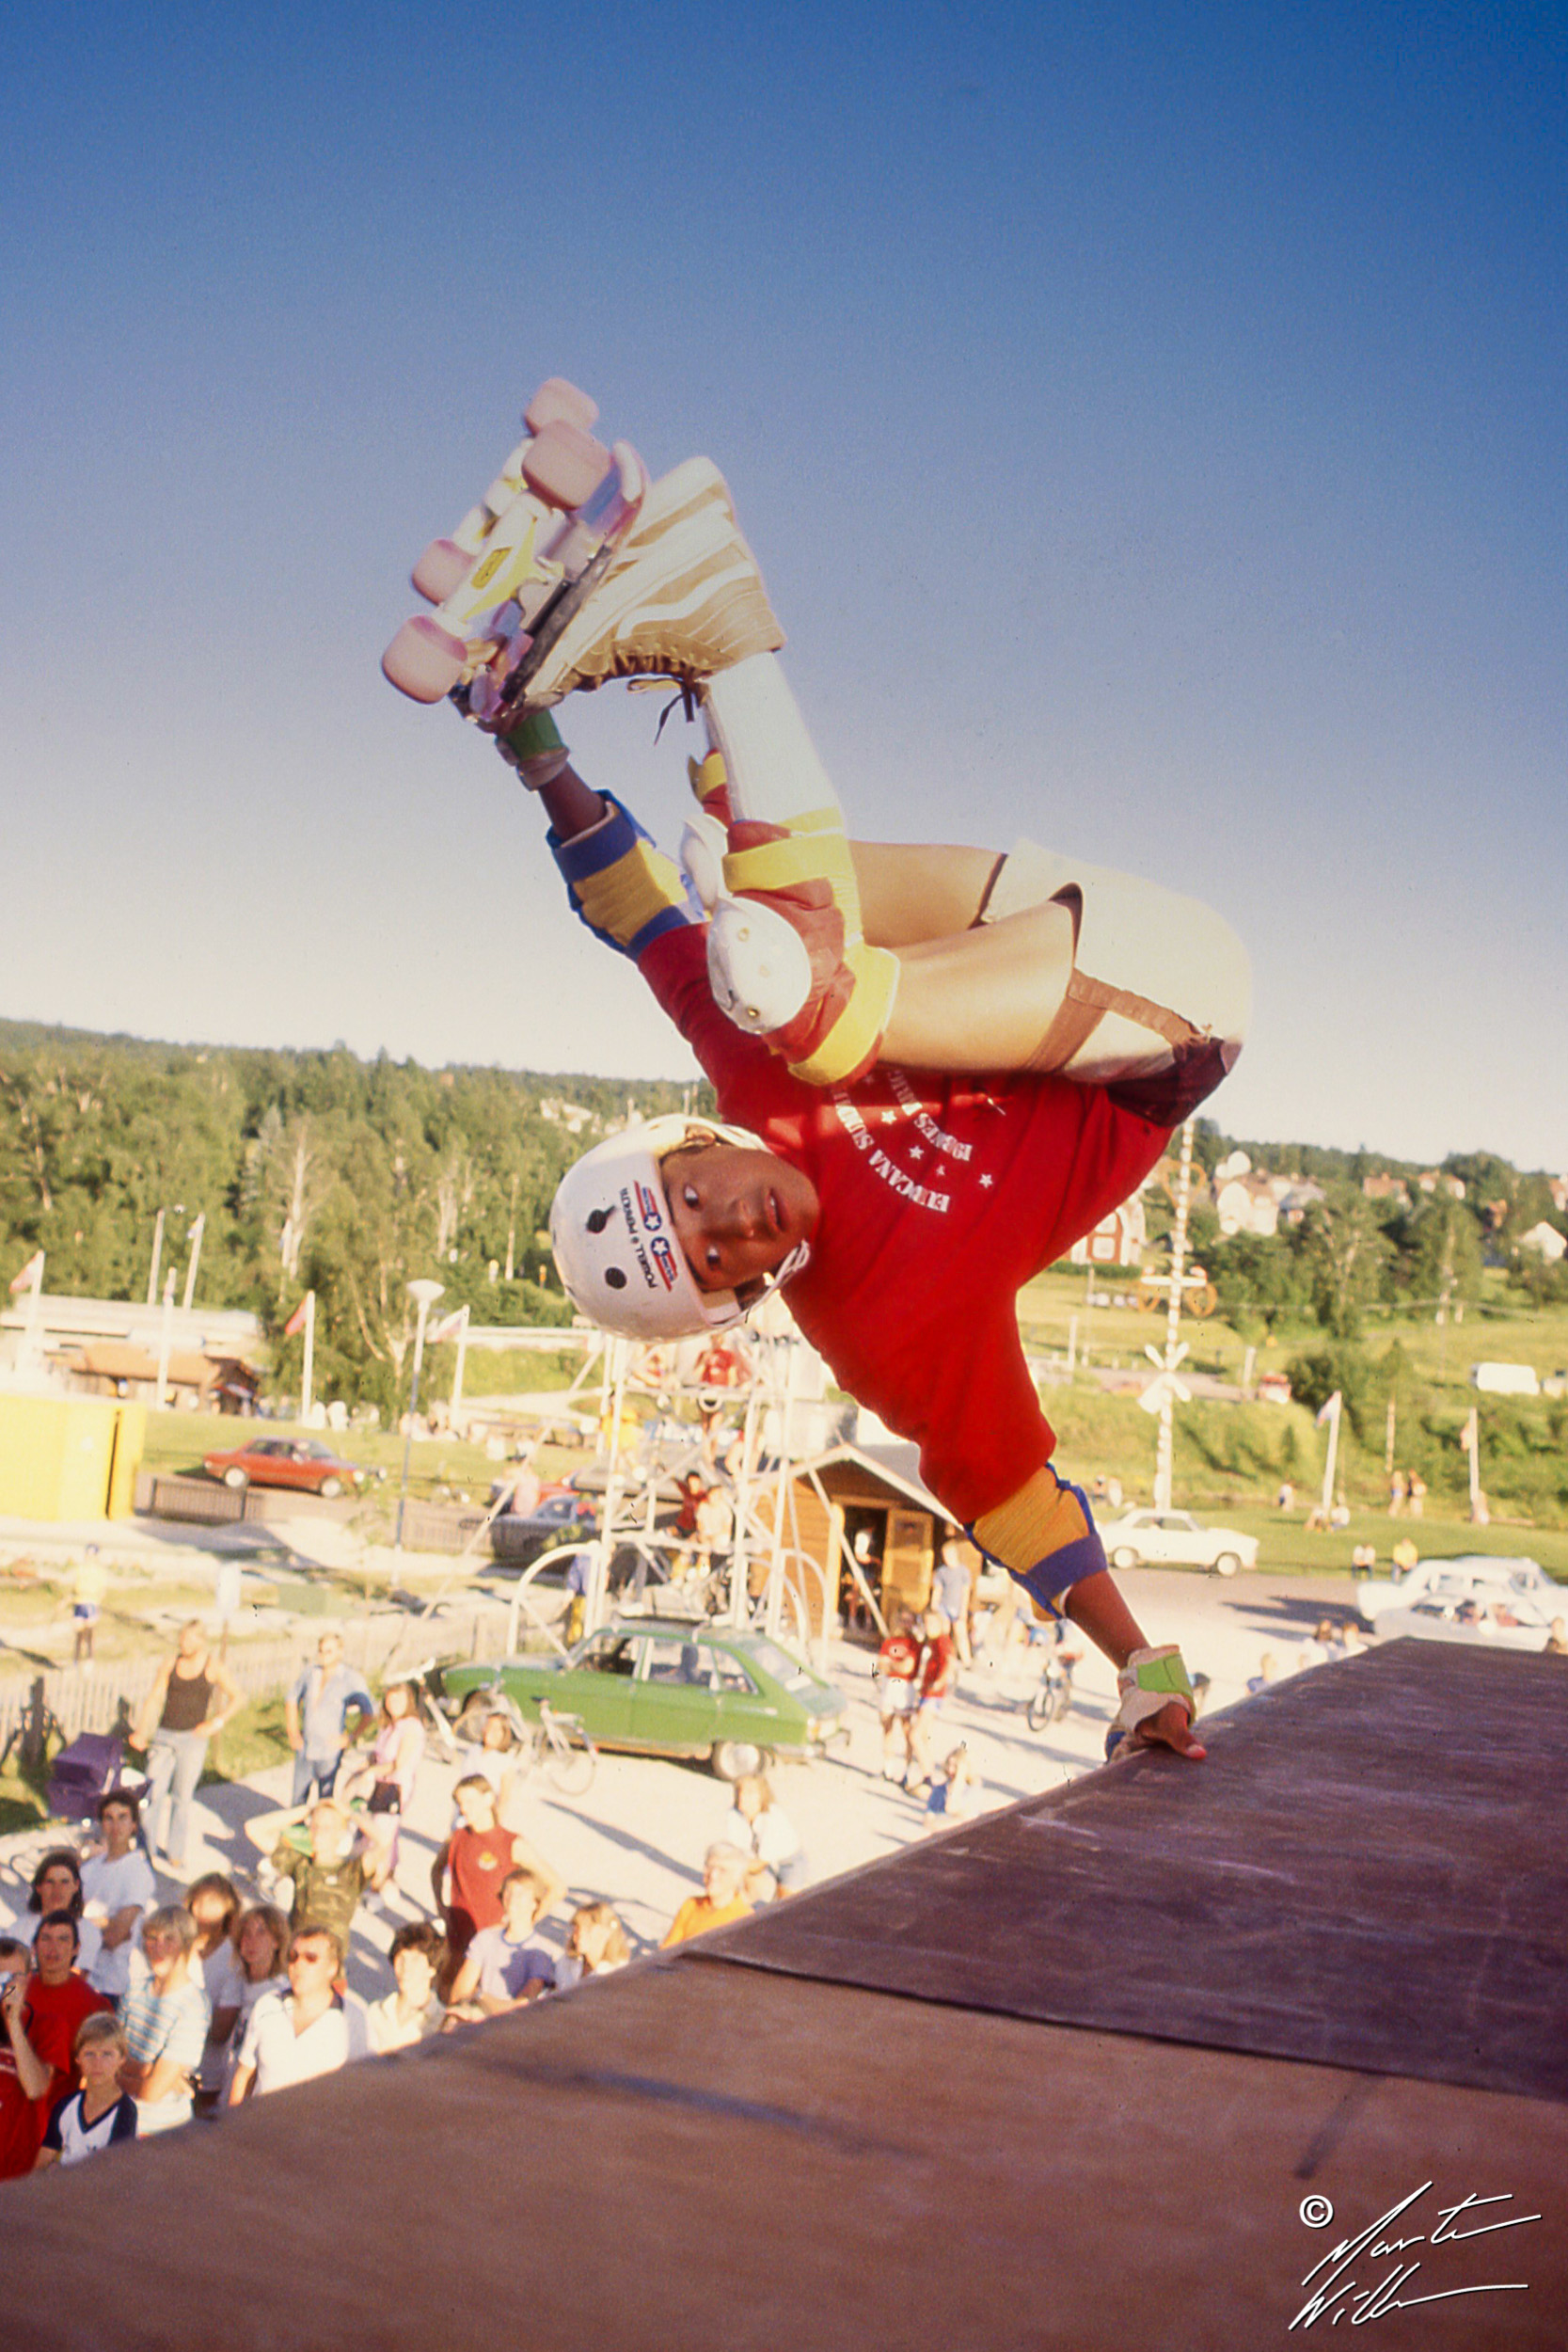 Steve Caballero, Frontside handplant,   Eurocana Summer Camp, Rättvik 1981